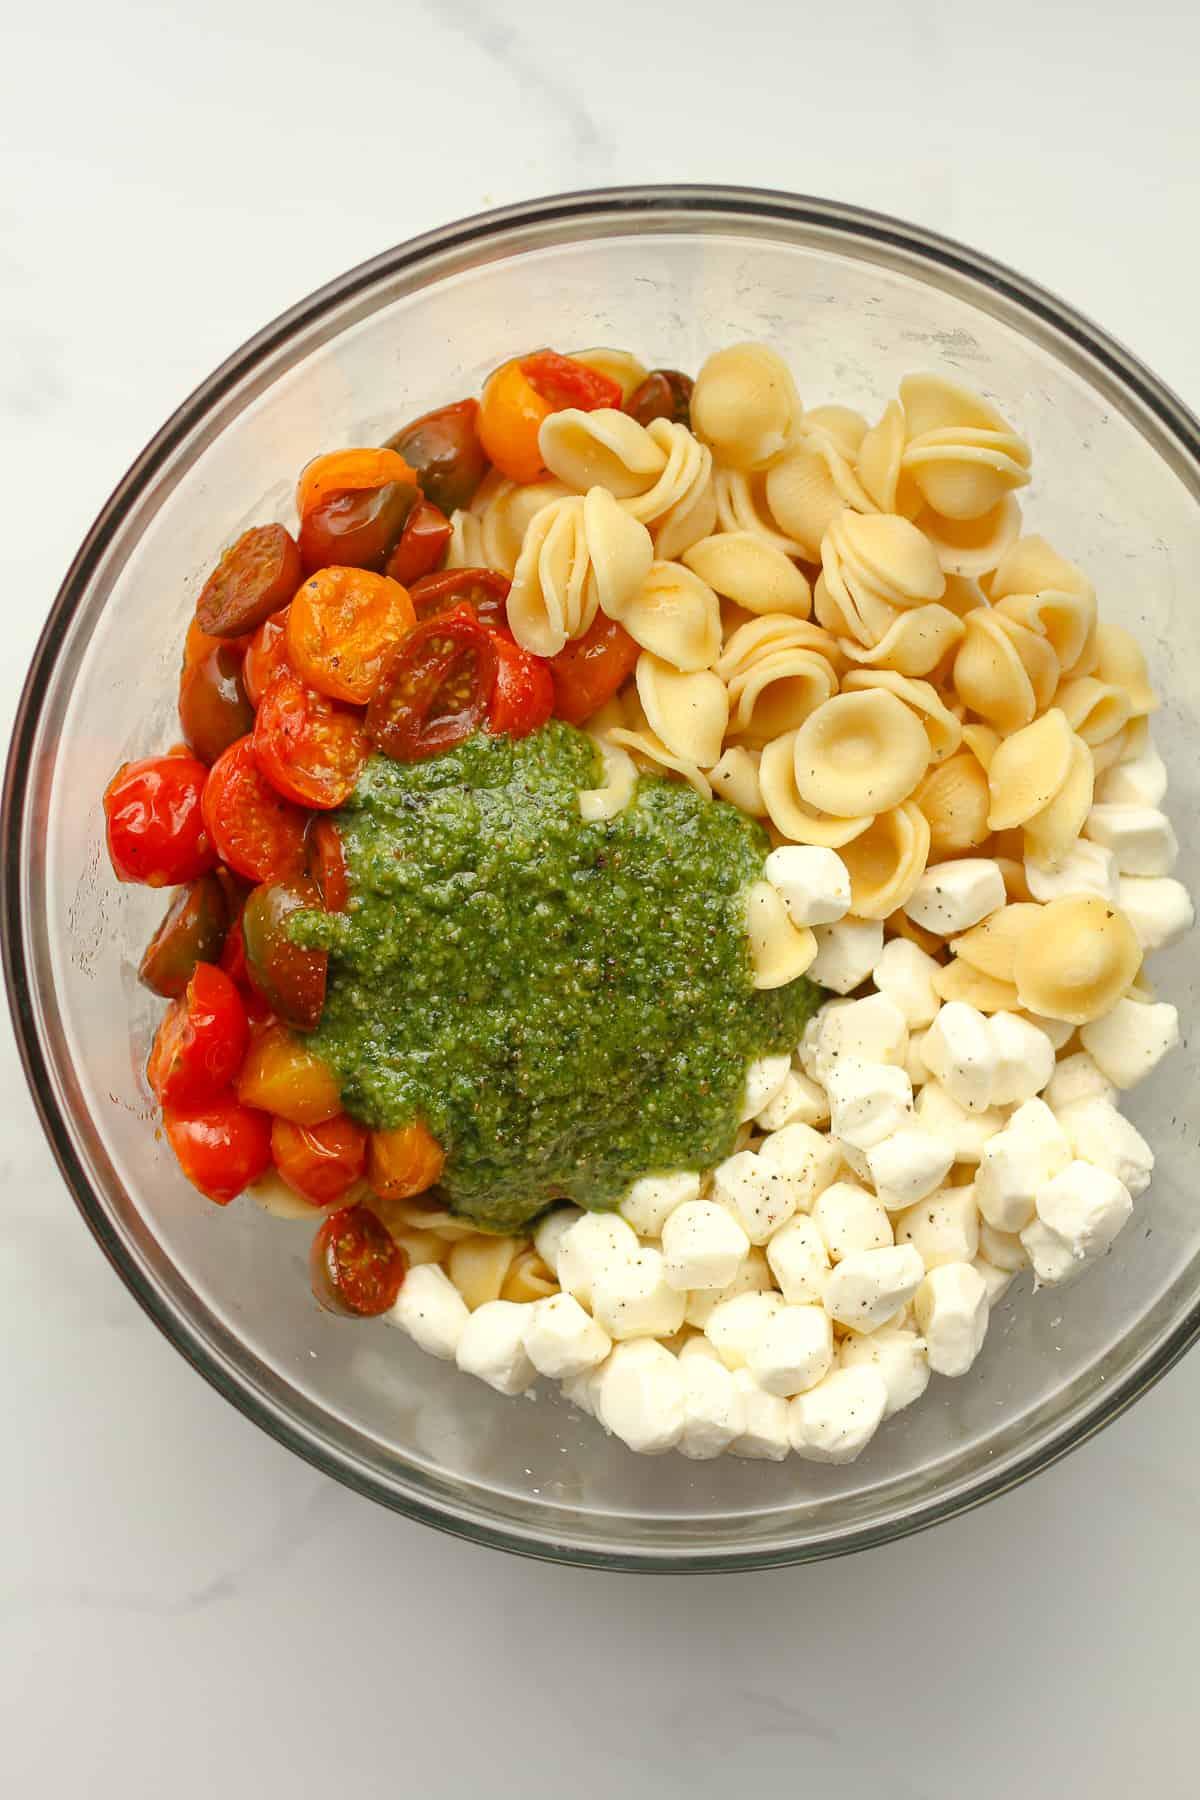 The bowl of ingredients separated by ingredient.